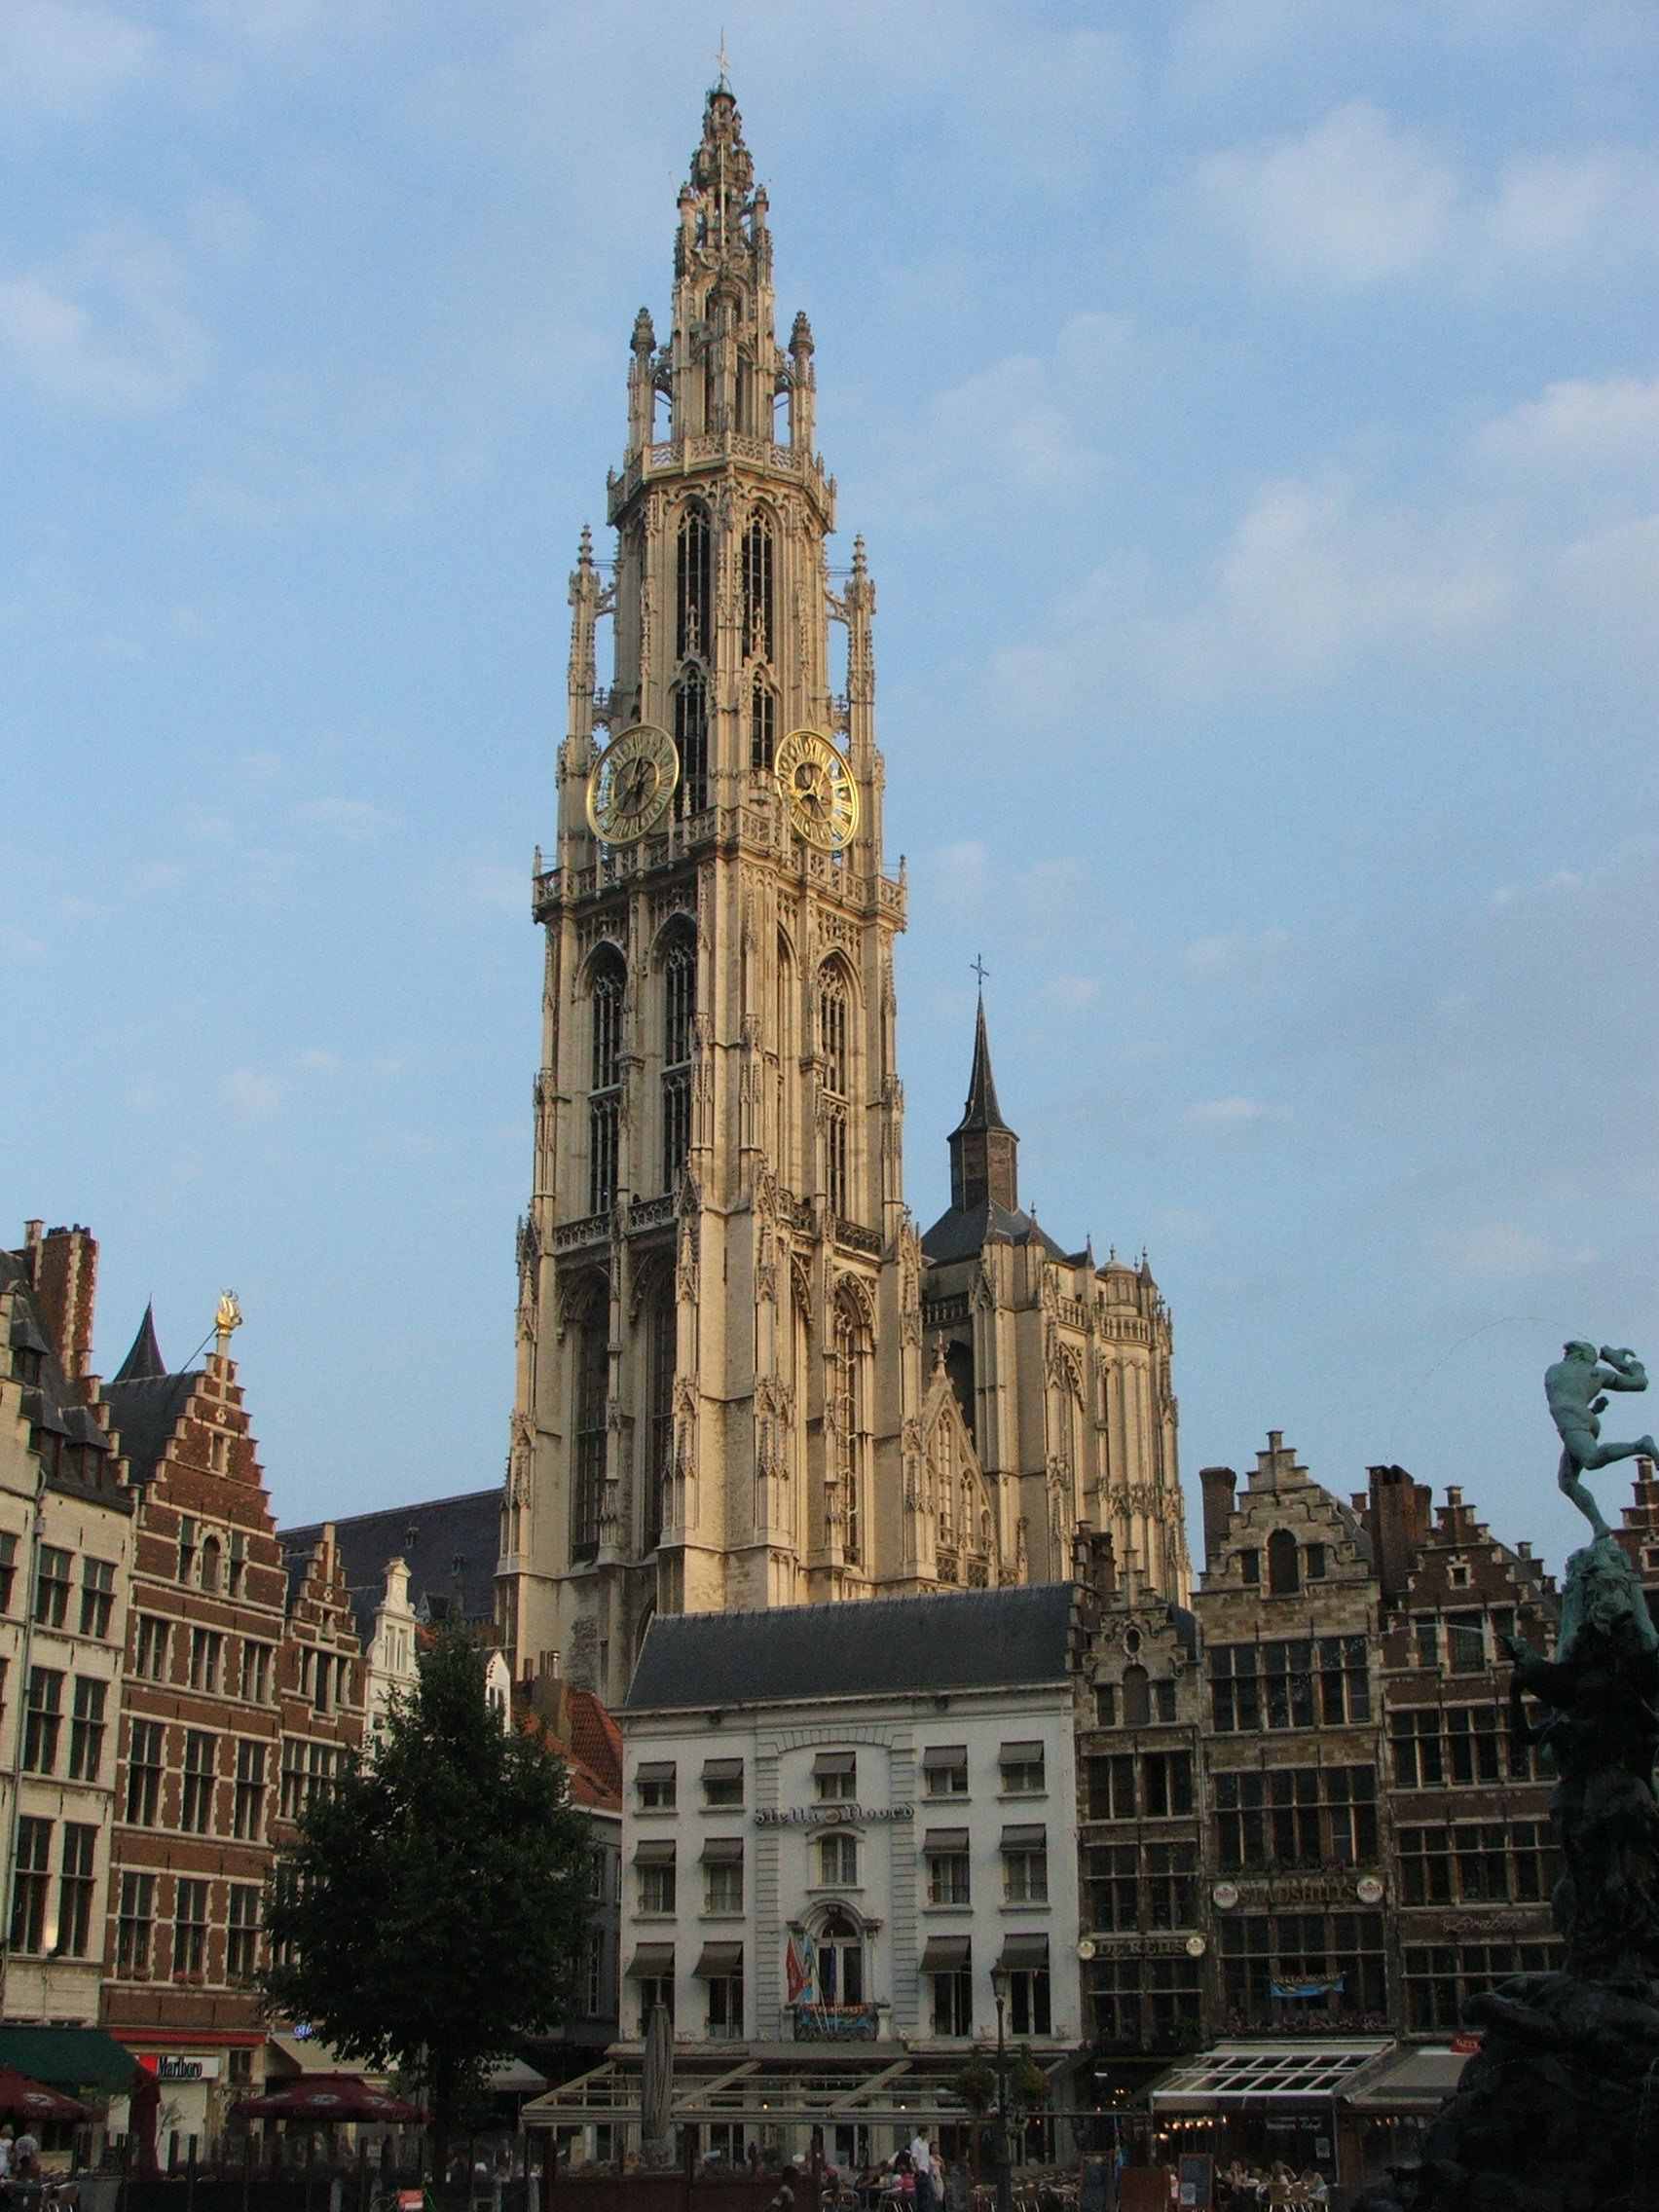 The Gothic Spire of Antwerp